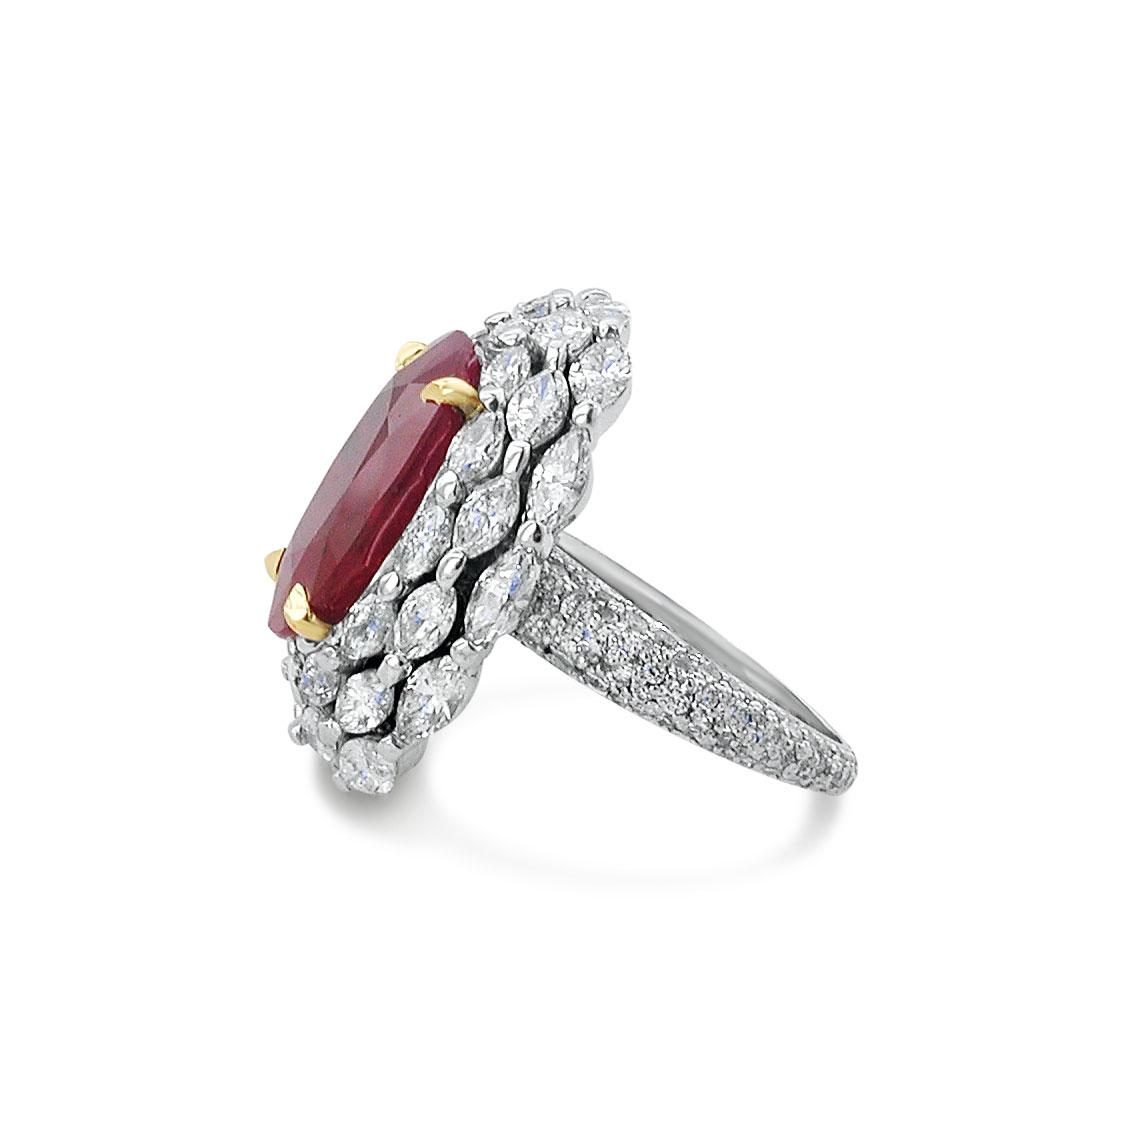 cad-man-jewellery-ruby-ring-side.jpg